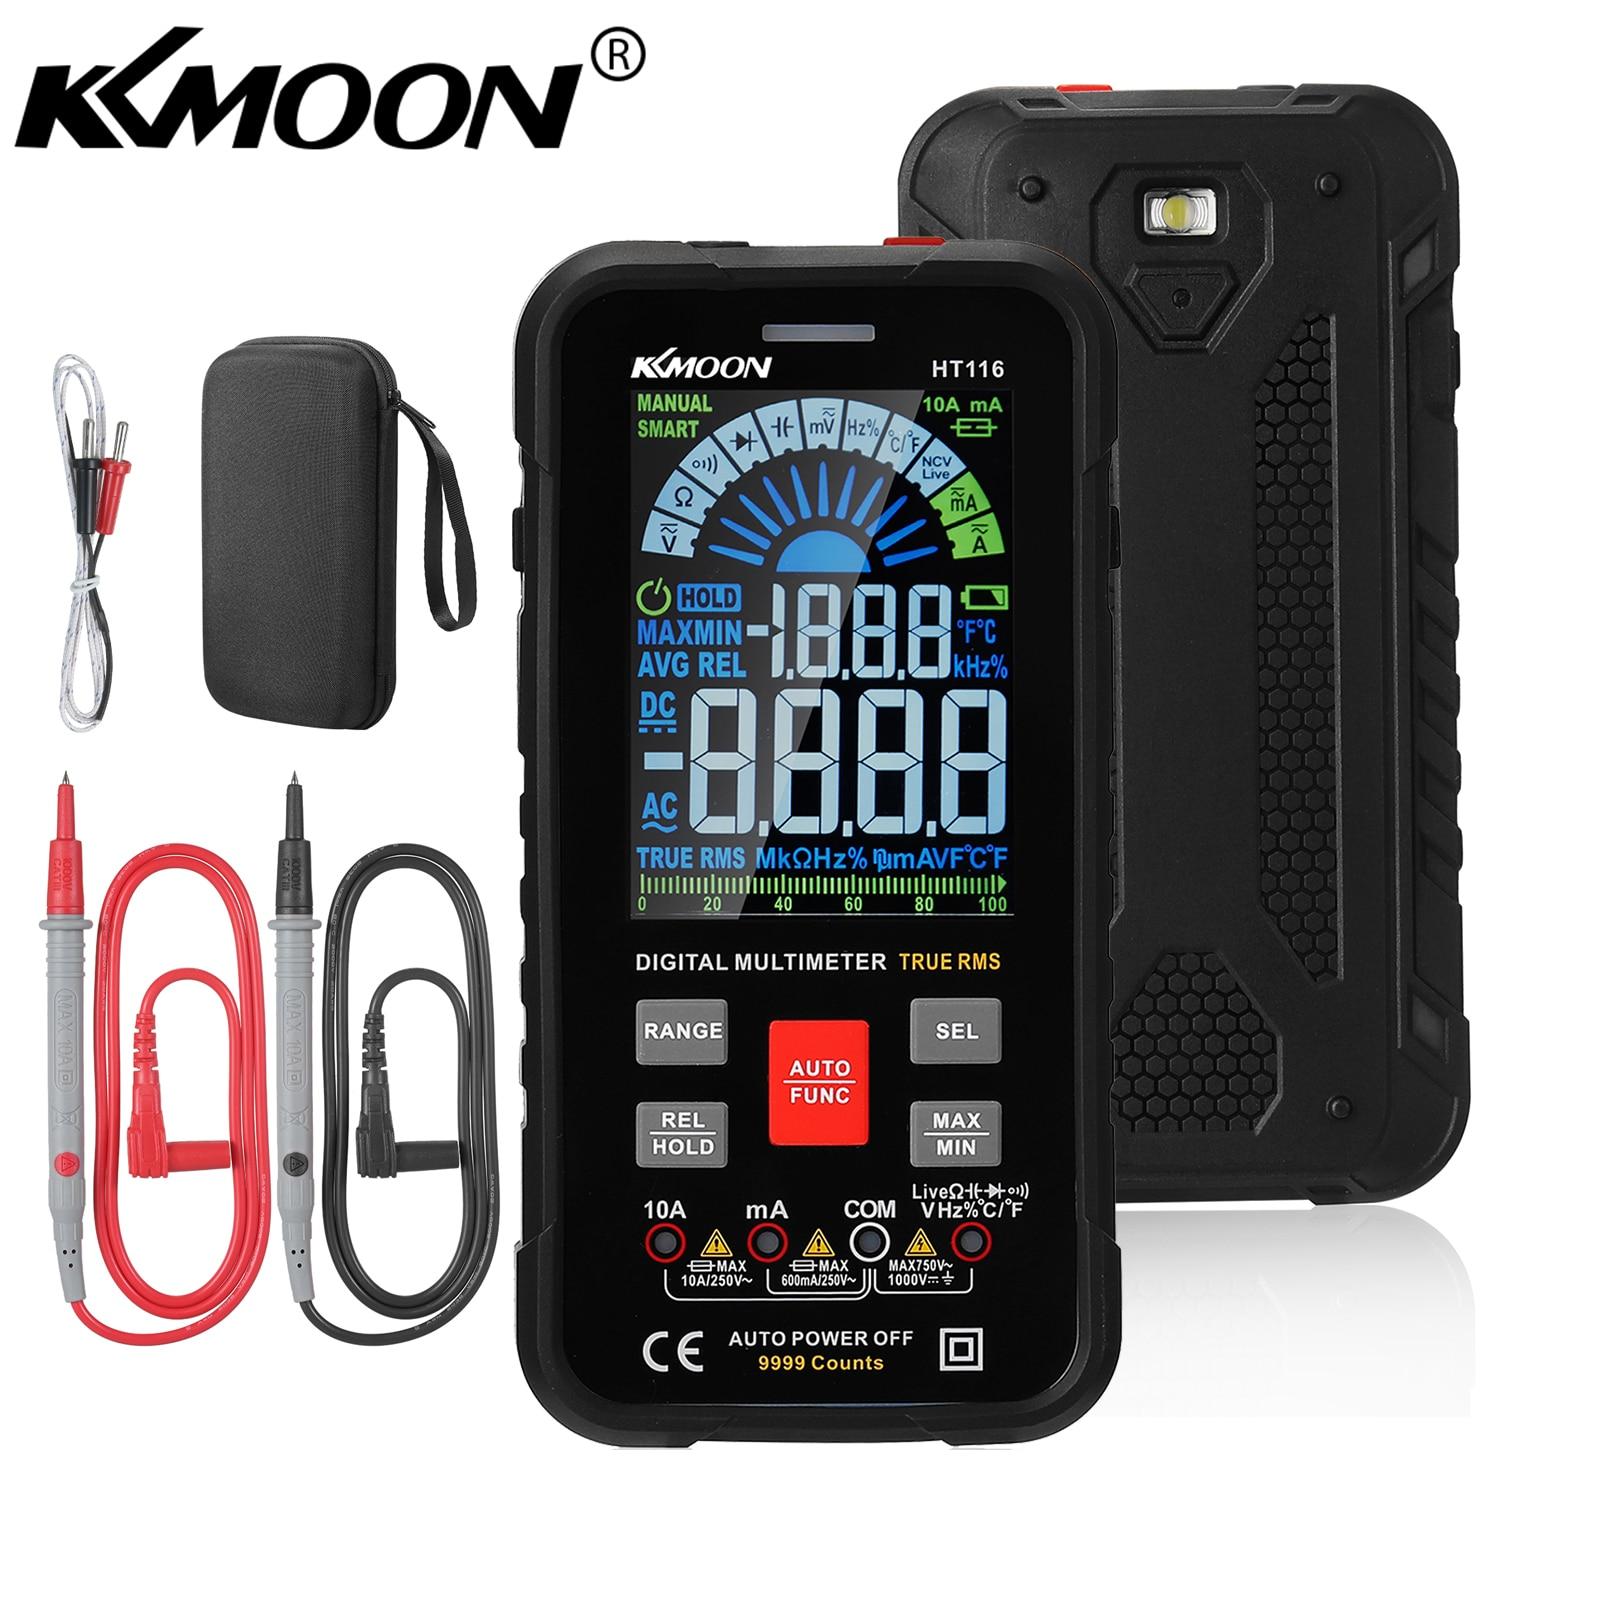 مقياس رقمي ذكي متعدد KKMOON HT116 شاشة كبيرة 9999 التهم Ture RMS NCV تيار ترددي مباشر جهد ترددي مقياس اختبار مباشر